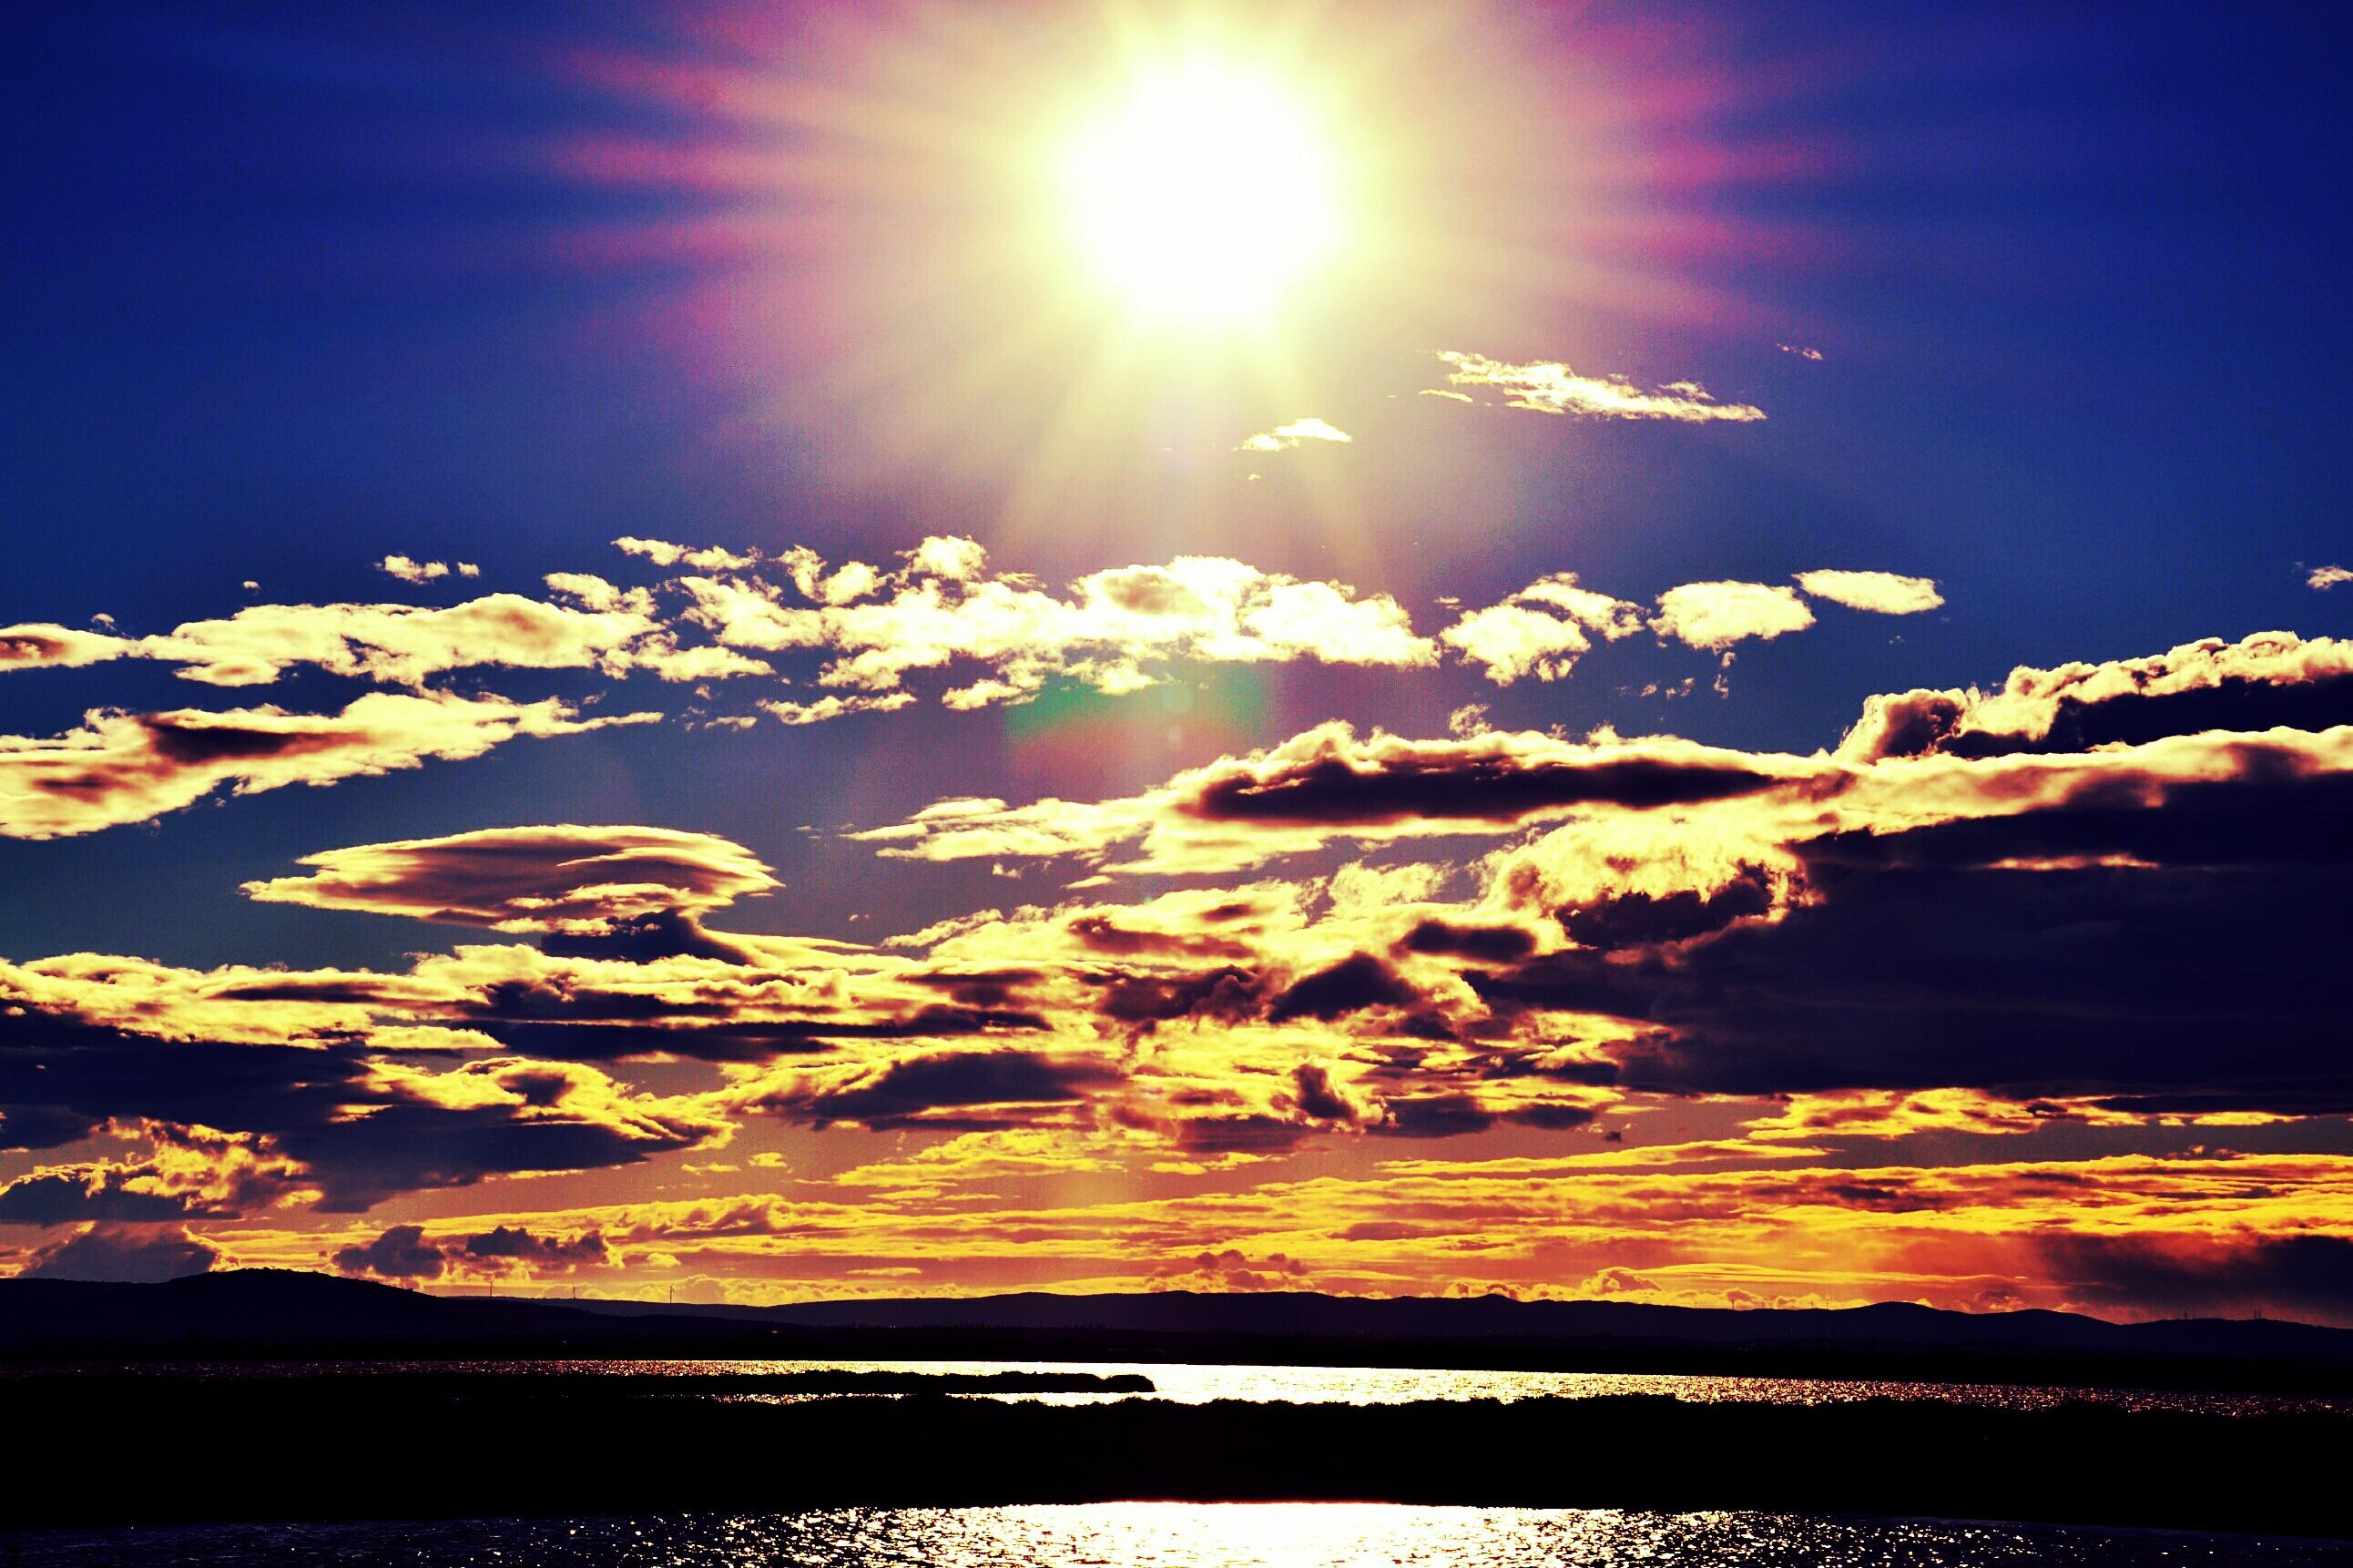 Картинку красивый восход солнца на лабе